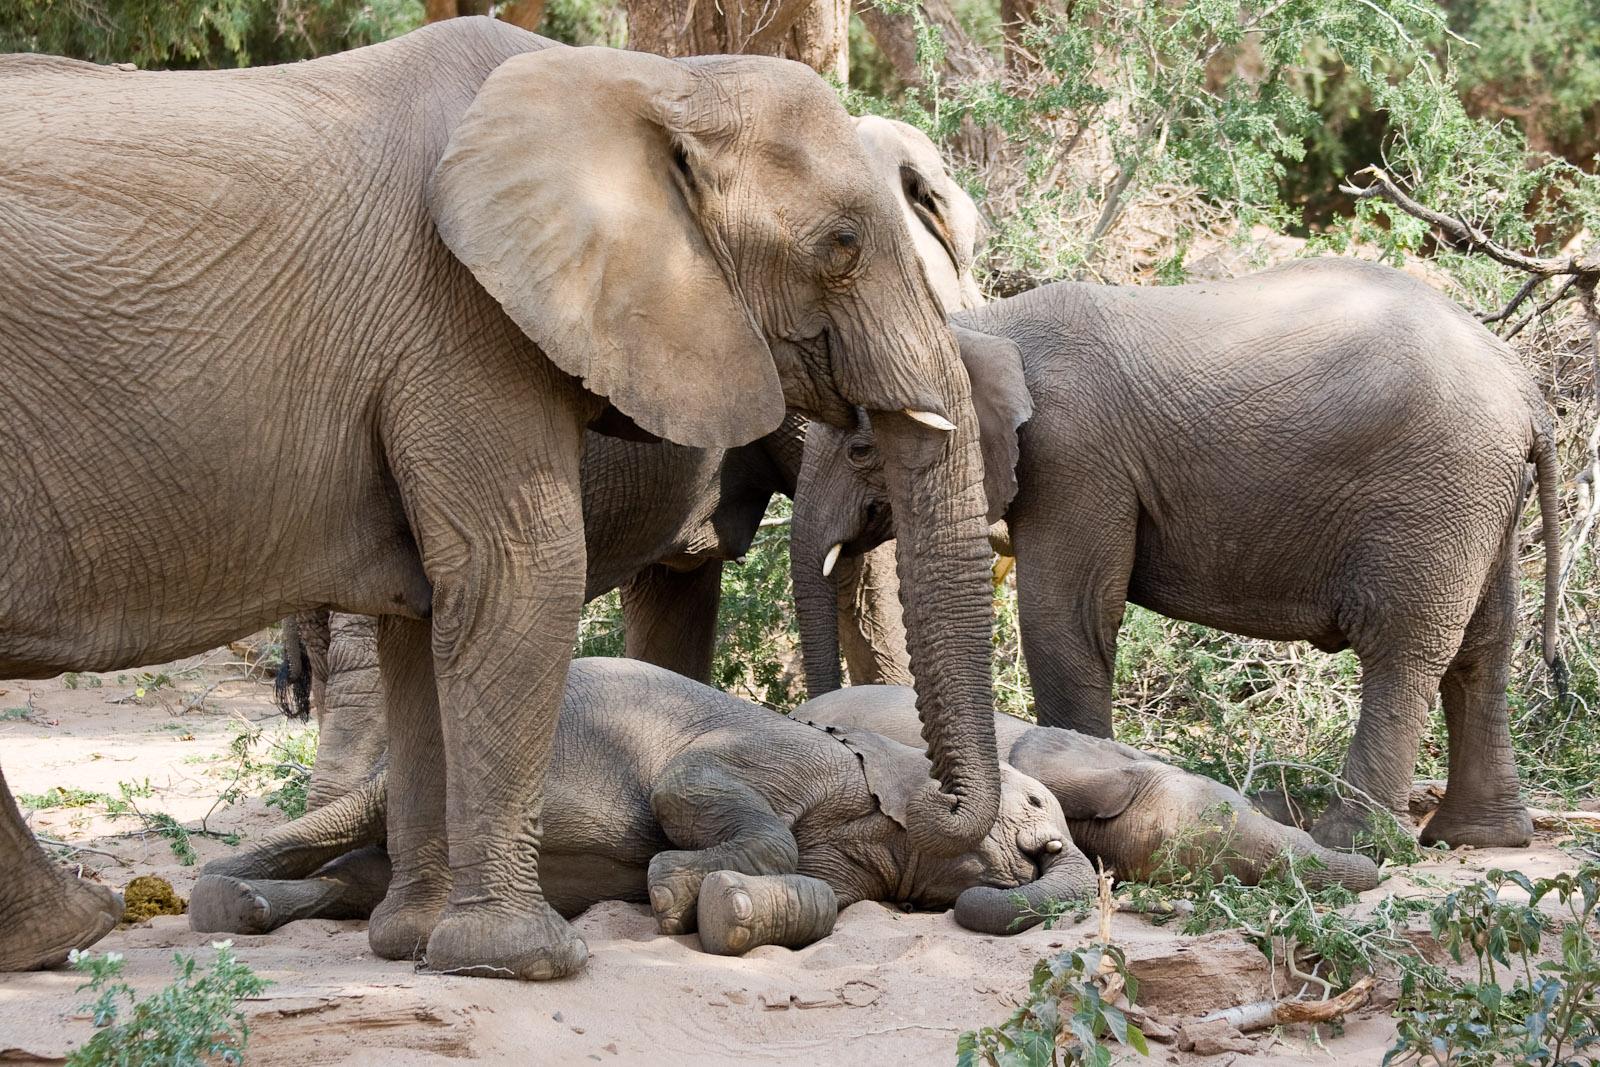 Elephants_with_Sleeping_Baby_%283689579663%29 - Tulog Aron Dali Motubo - Tira-Pasagad | Saksak-Sinagol